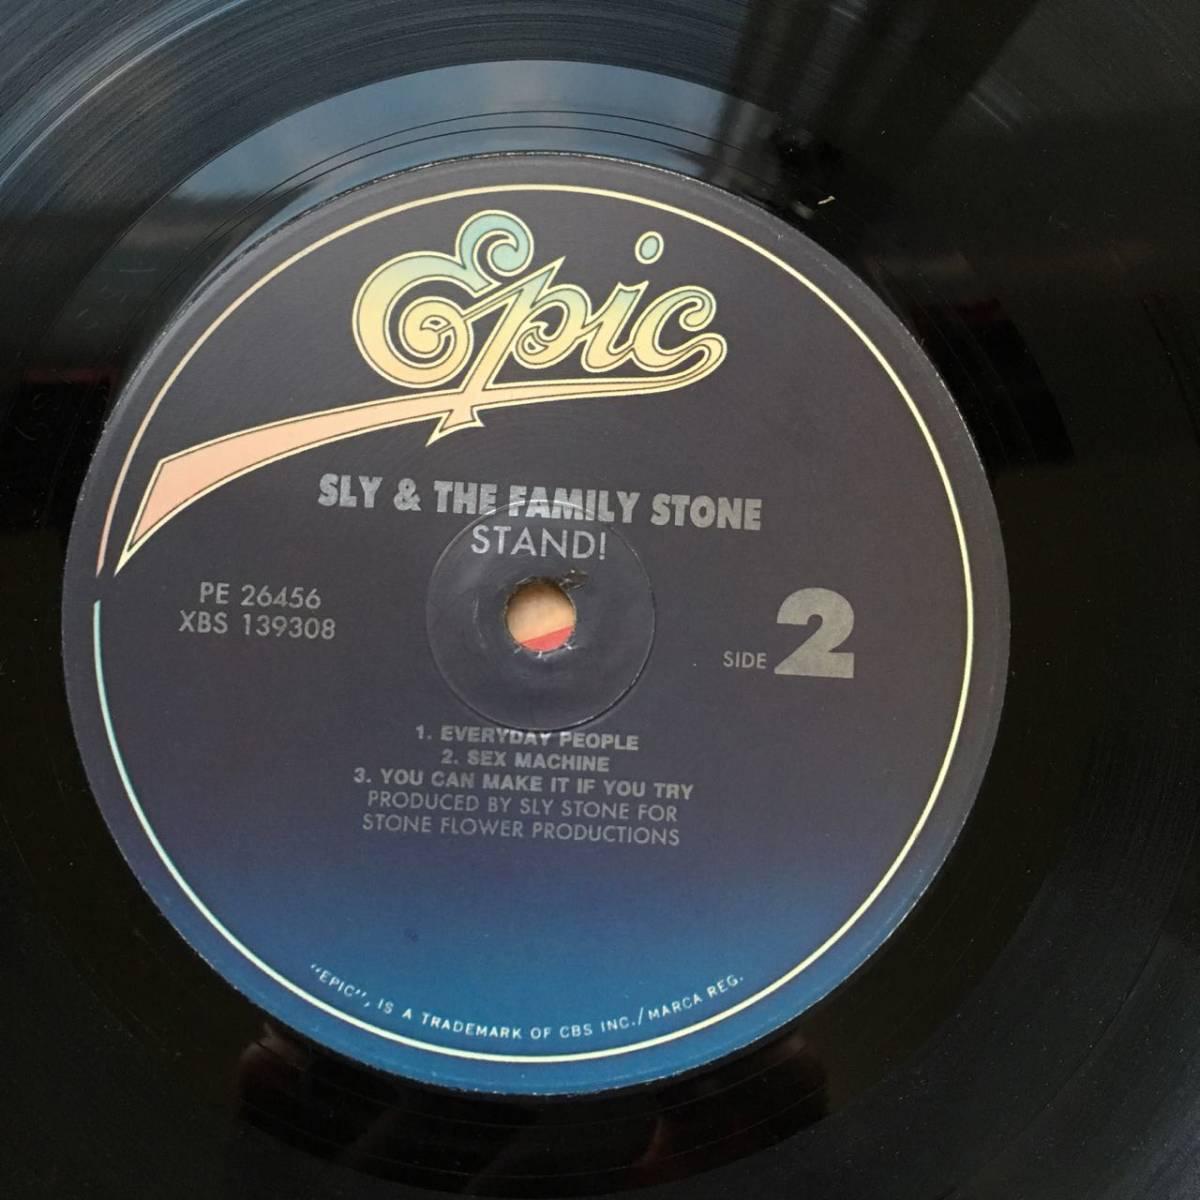 【LP・米盤/EPIC PE-26456】SLY & THE FAMILY STONE(スライ&ザ ファミリーストーン)/ STAND(スタンド)_画像4